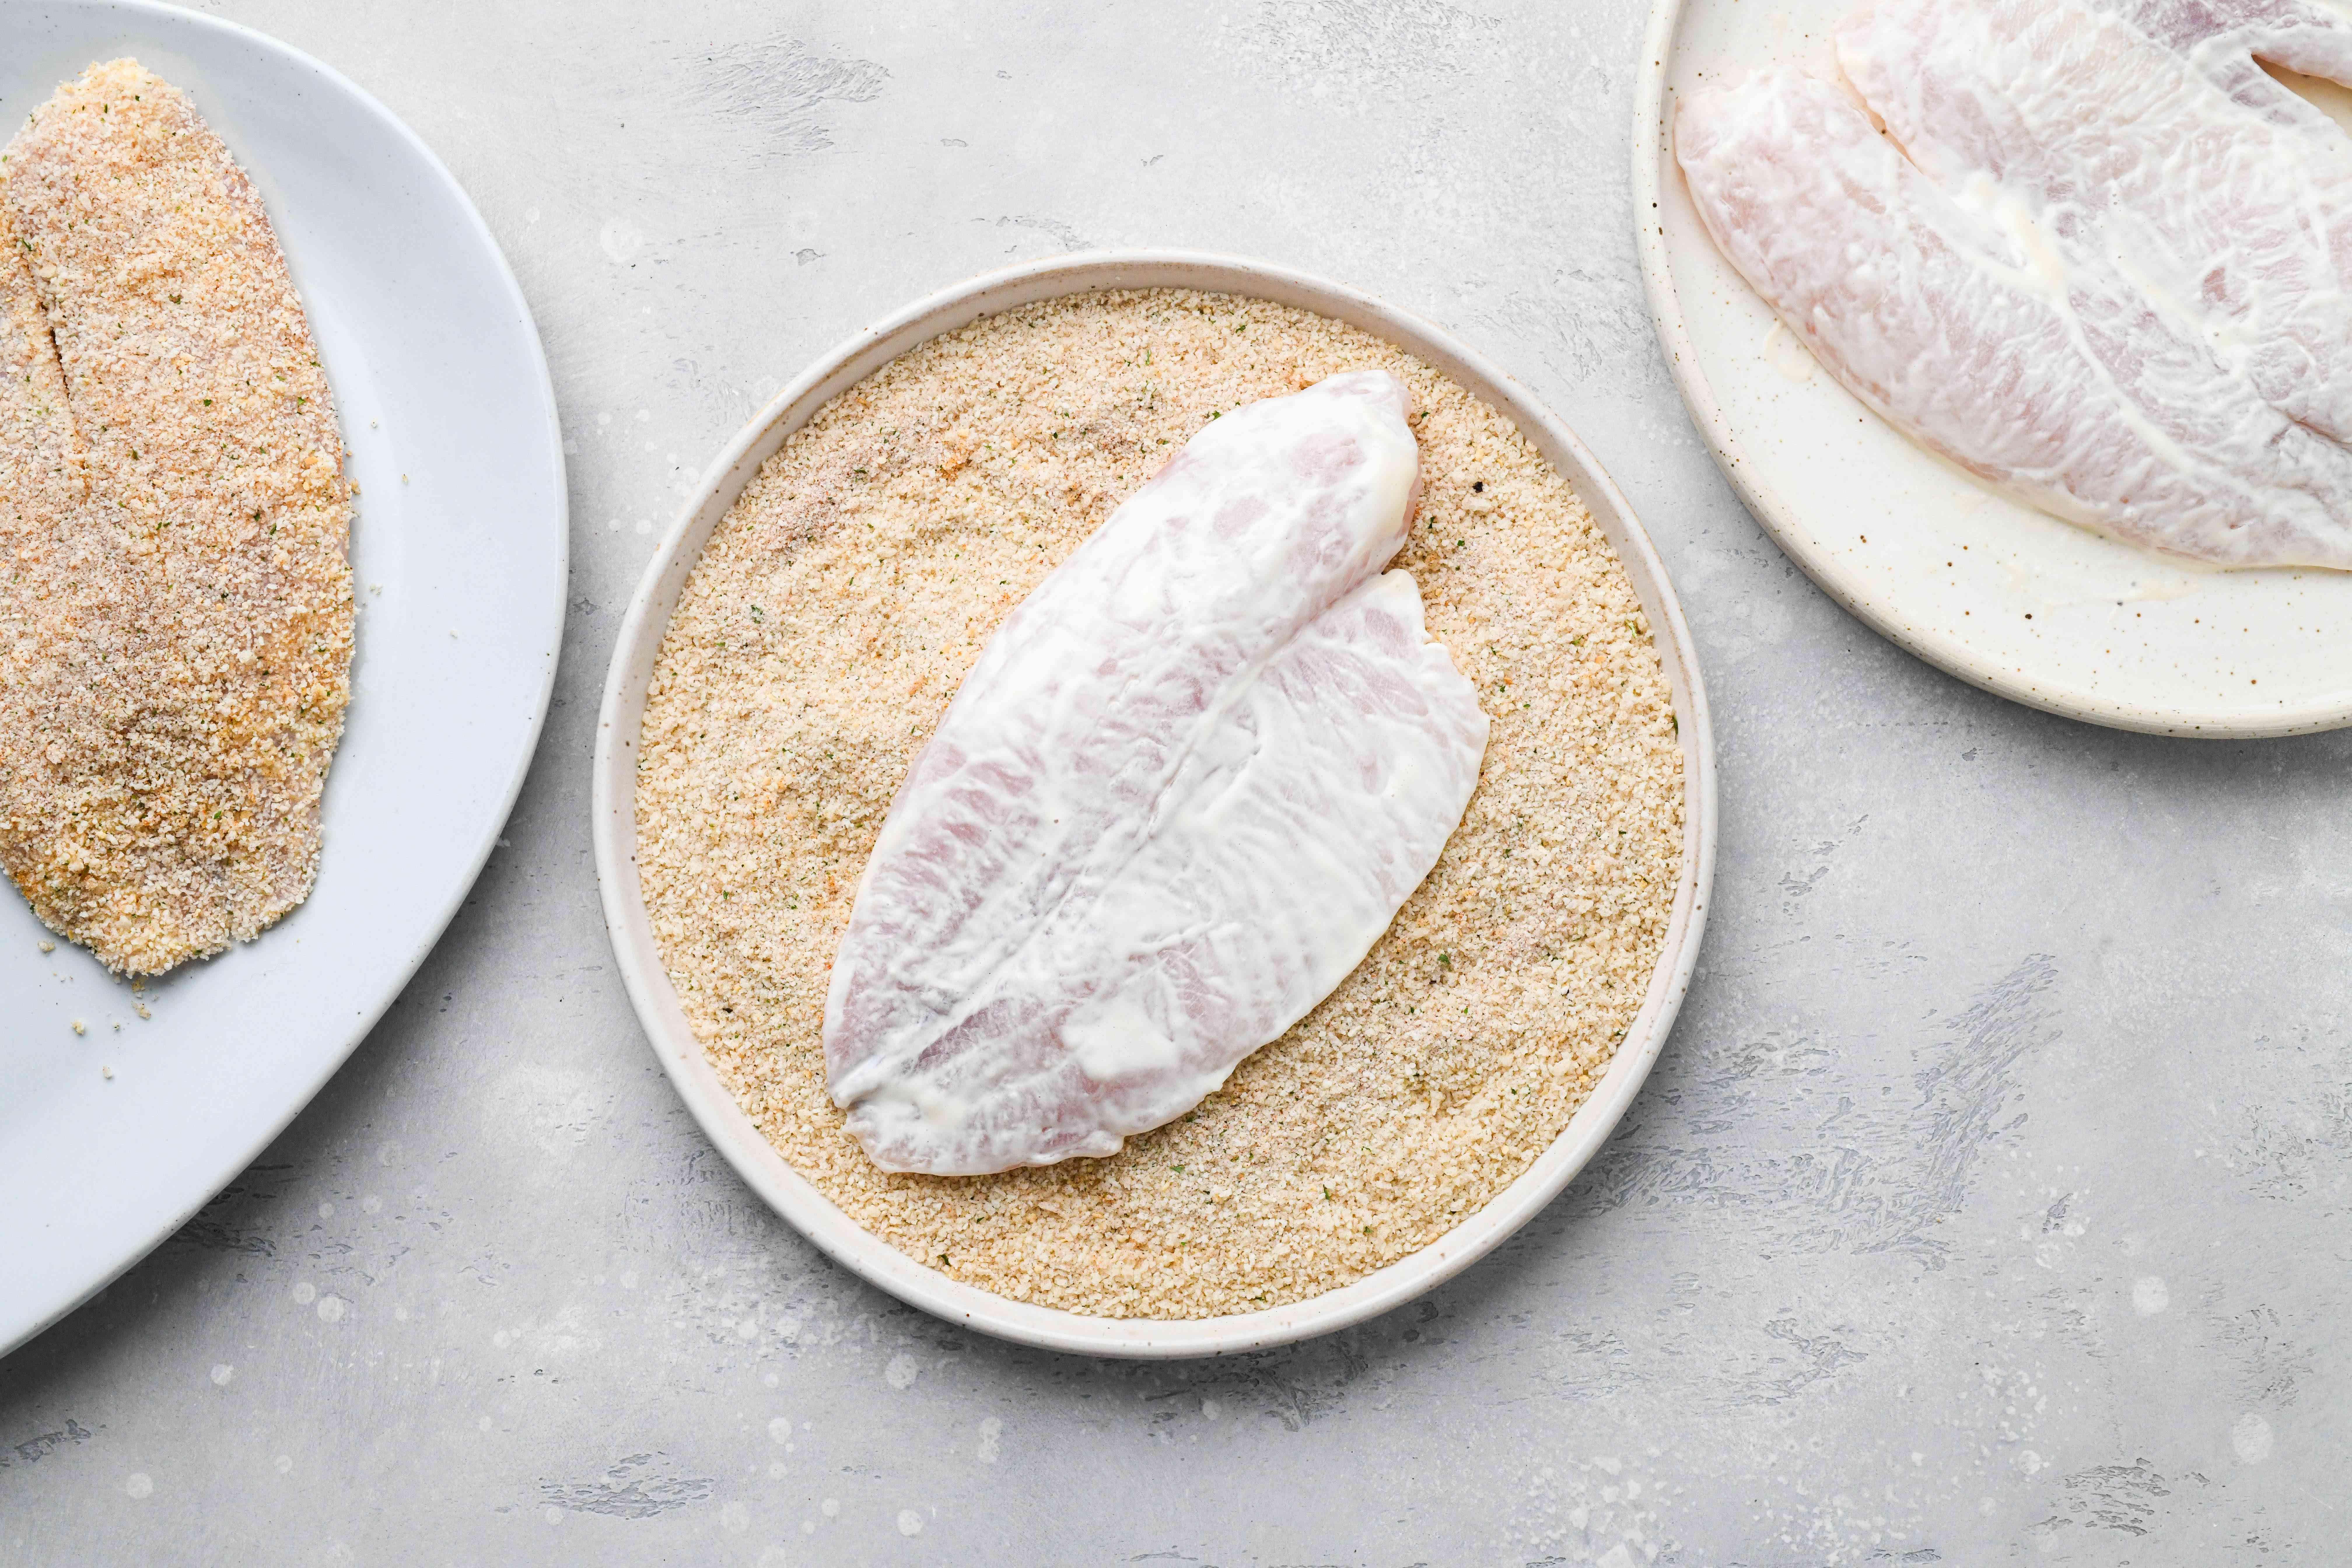 tilapia dipped in bread crumbs